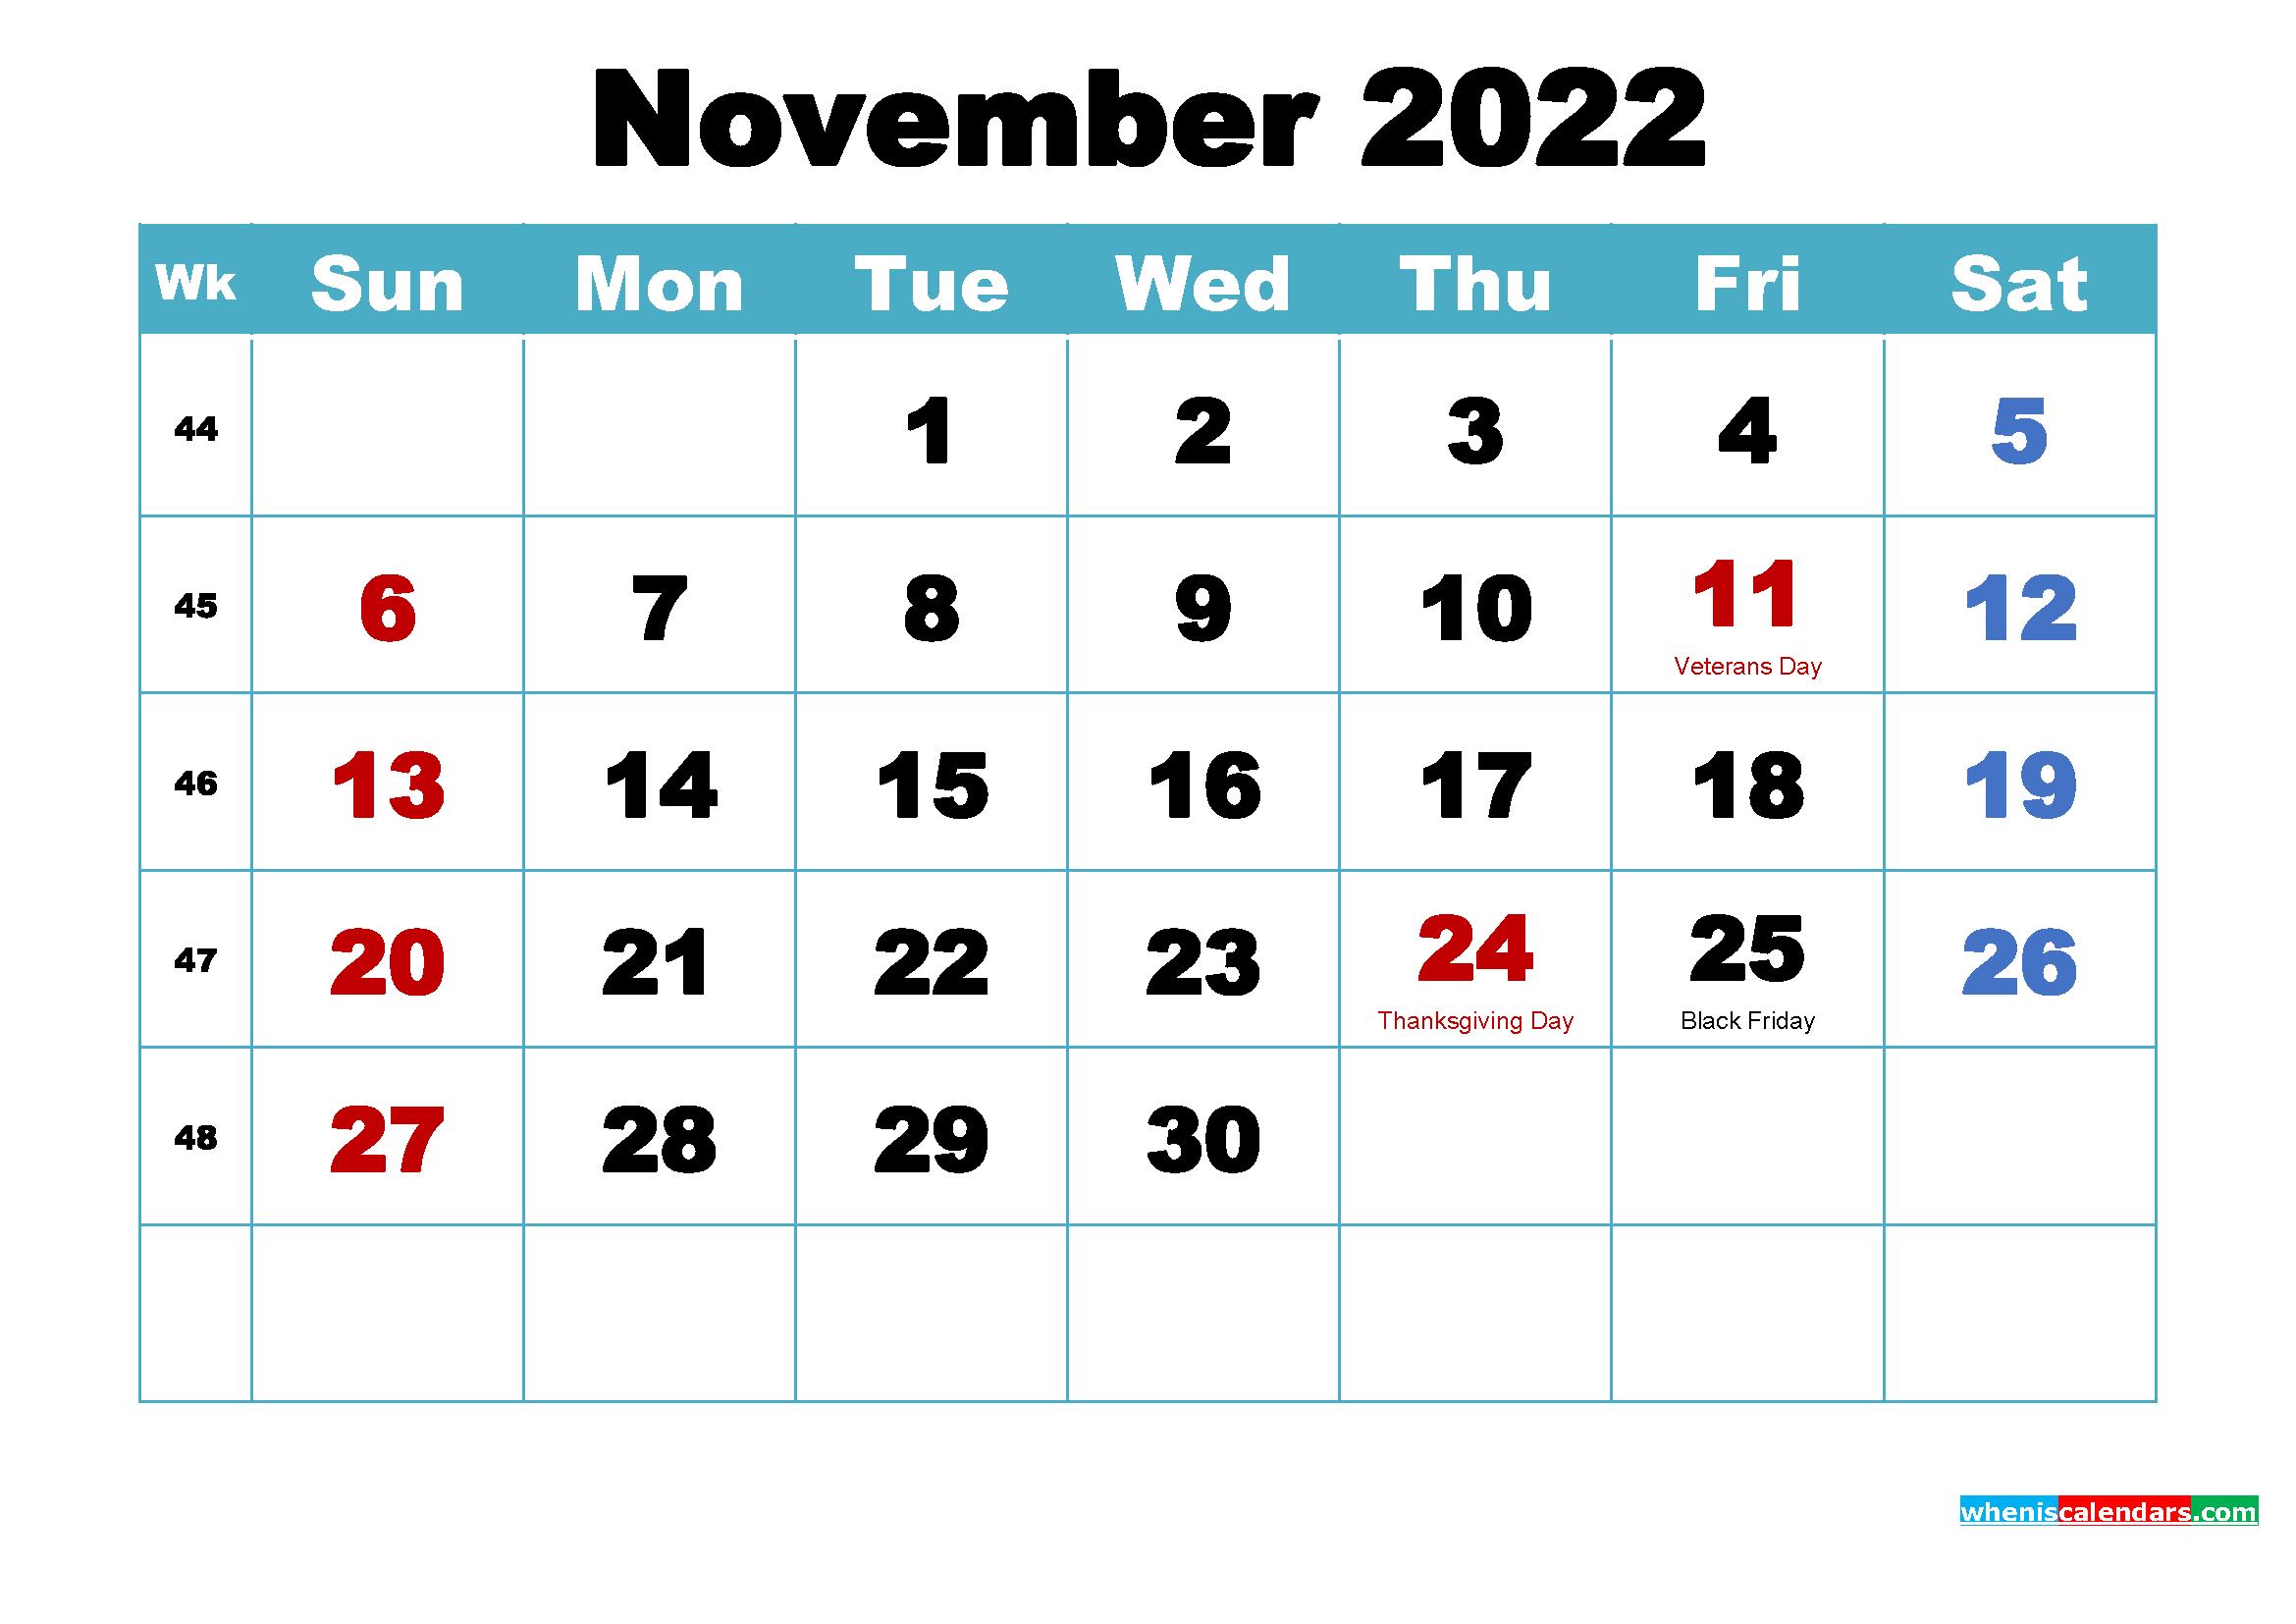 November 2022 Calendar Wallpaper Free Download